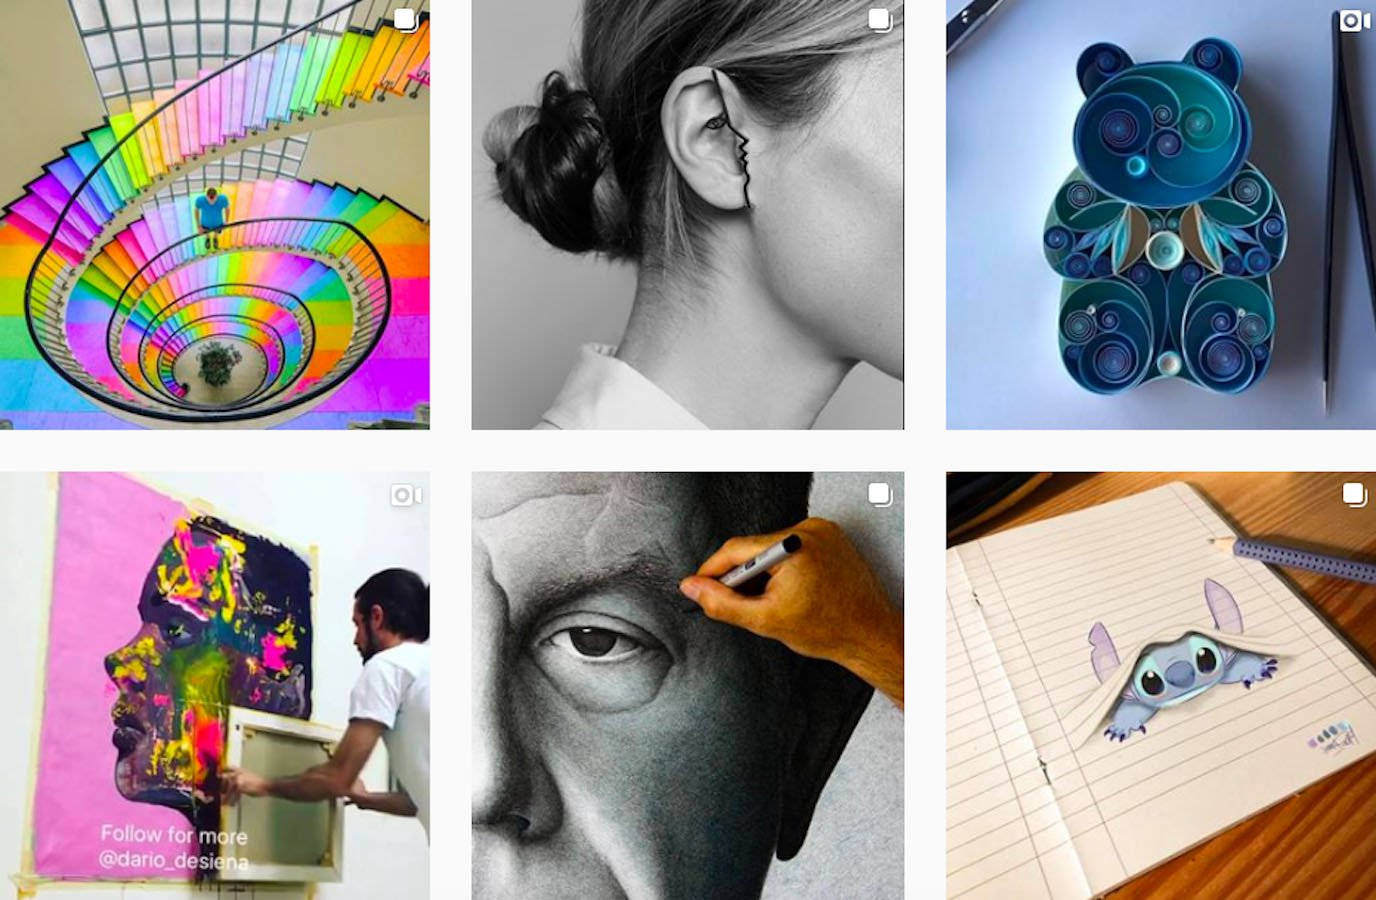 Web Design Inspiration: 110+ Accounts On Instagram and 10+ Best UX & Web Design Books in 2020 - art whisper